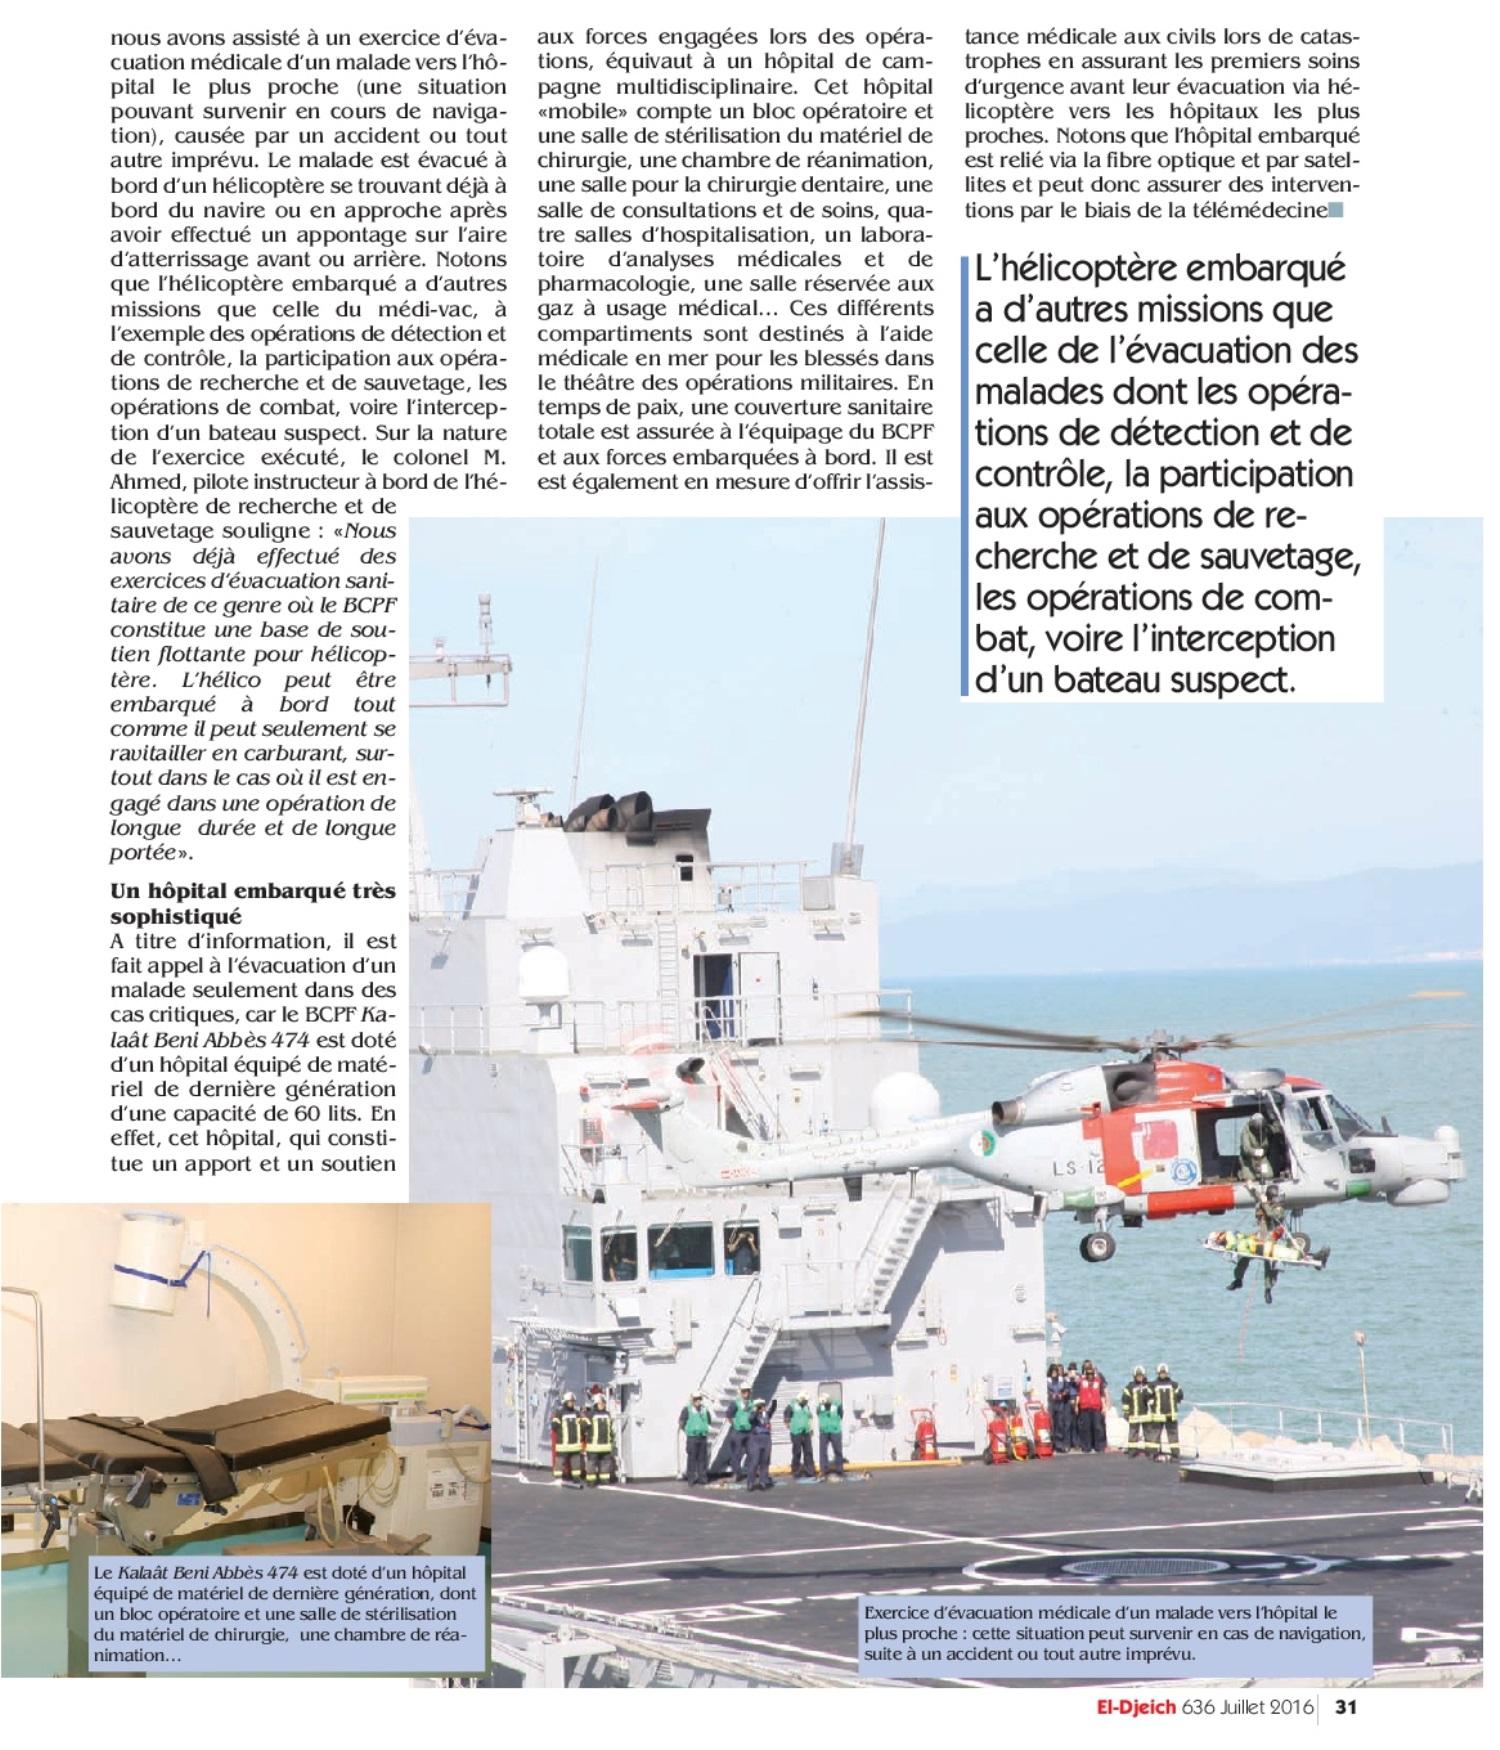 Armée Algérienne (ANP) - Tome XIV - Page 37 27736702864_2cb461fb0b_o